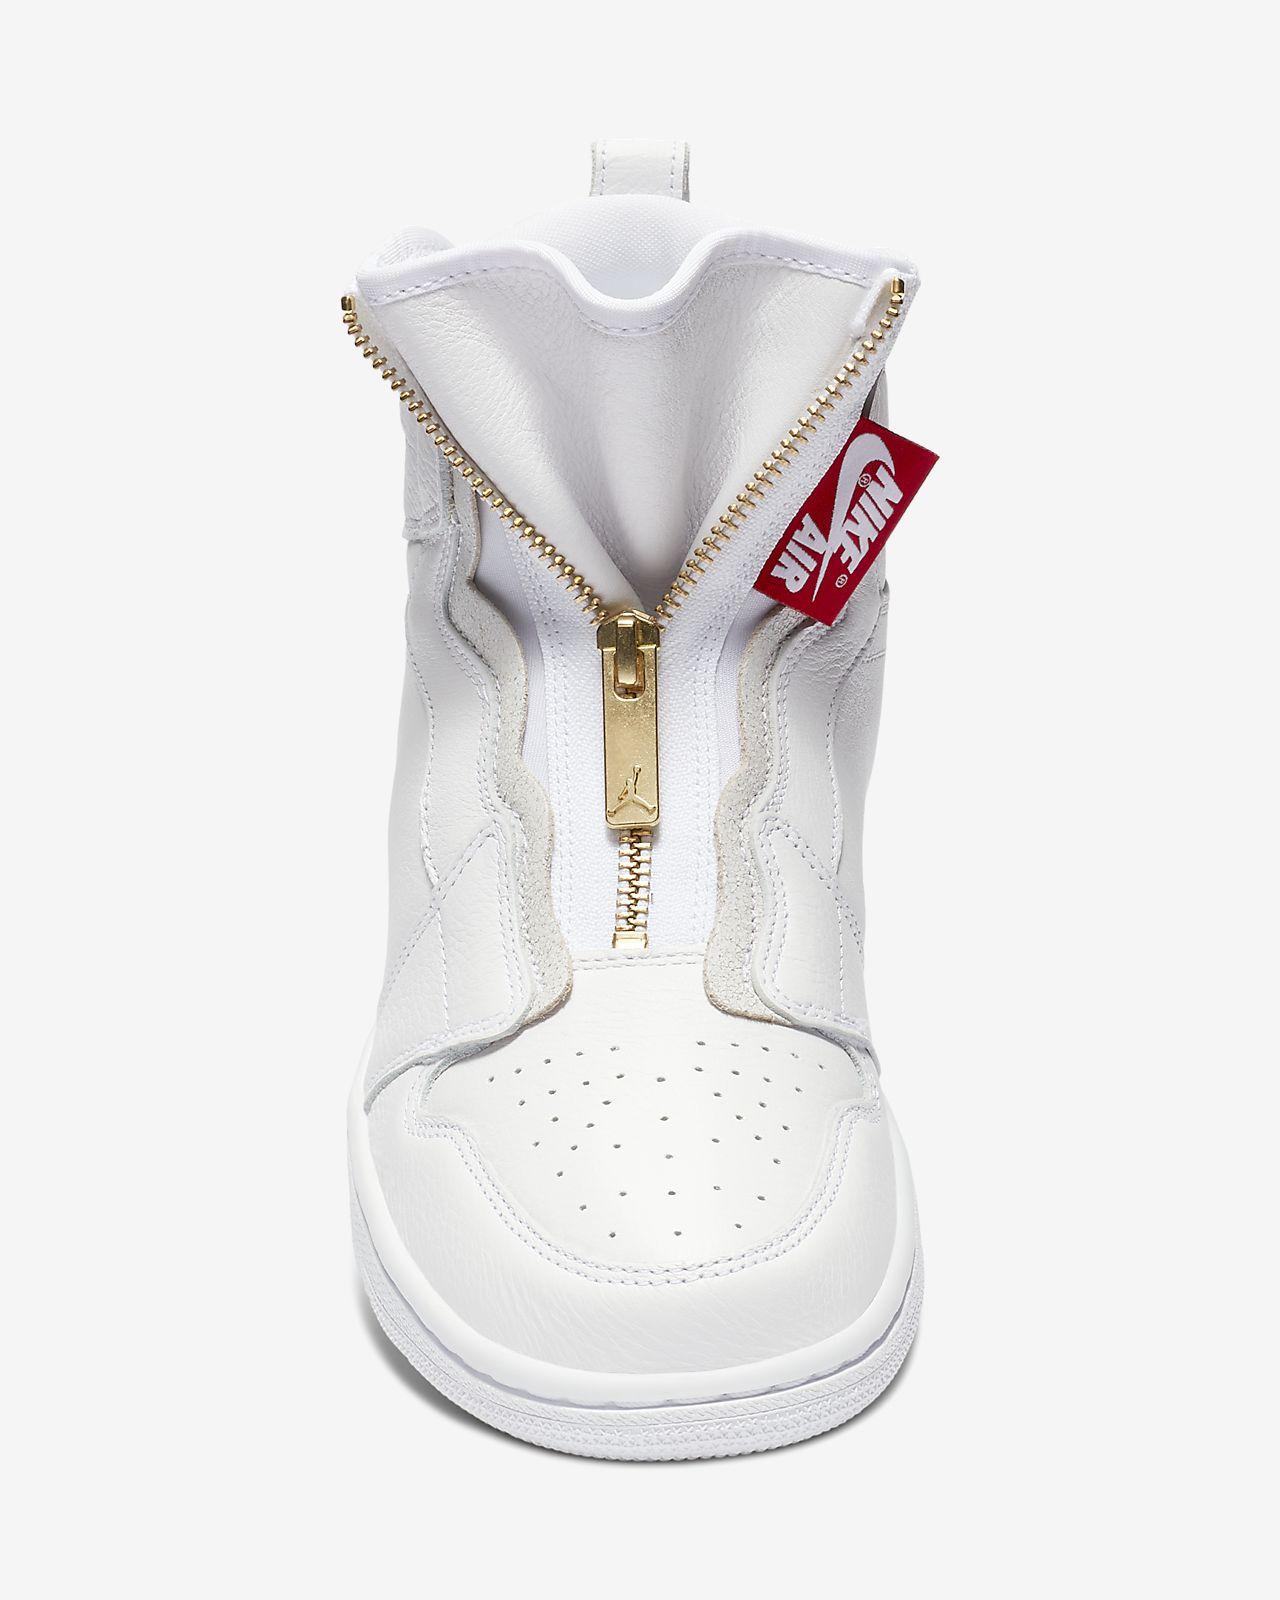 Air Jordan 1 High Zip Damenschuh